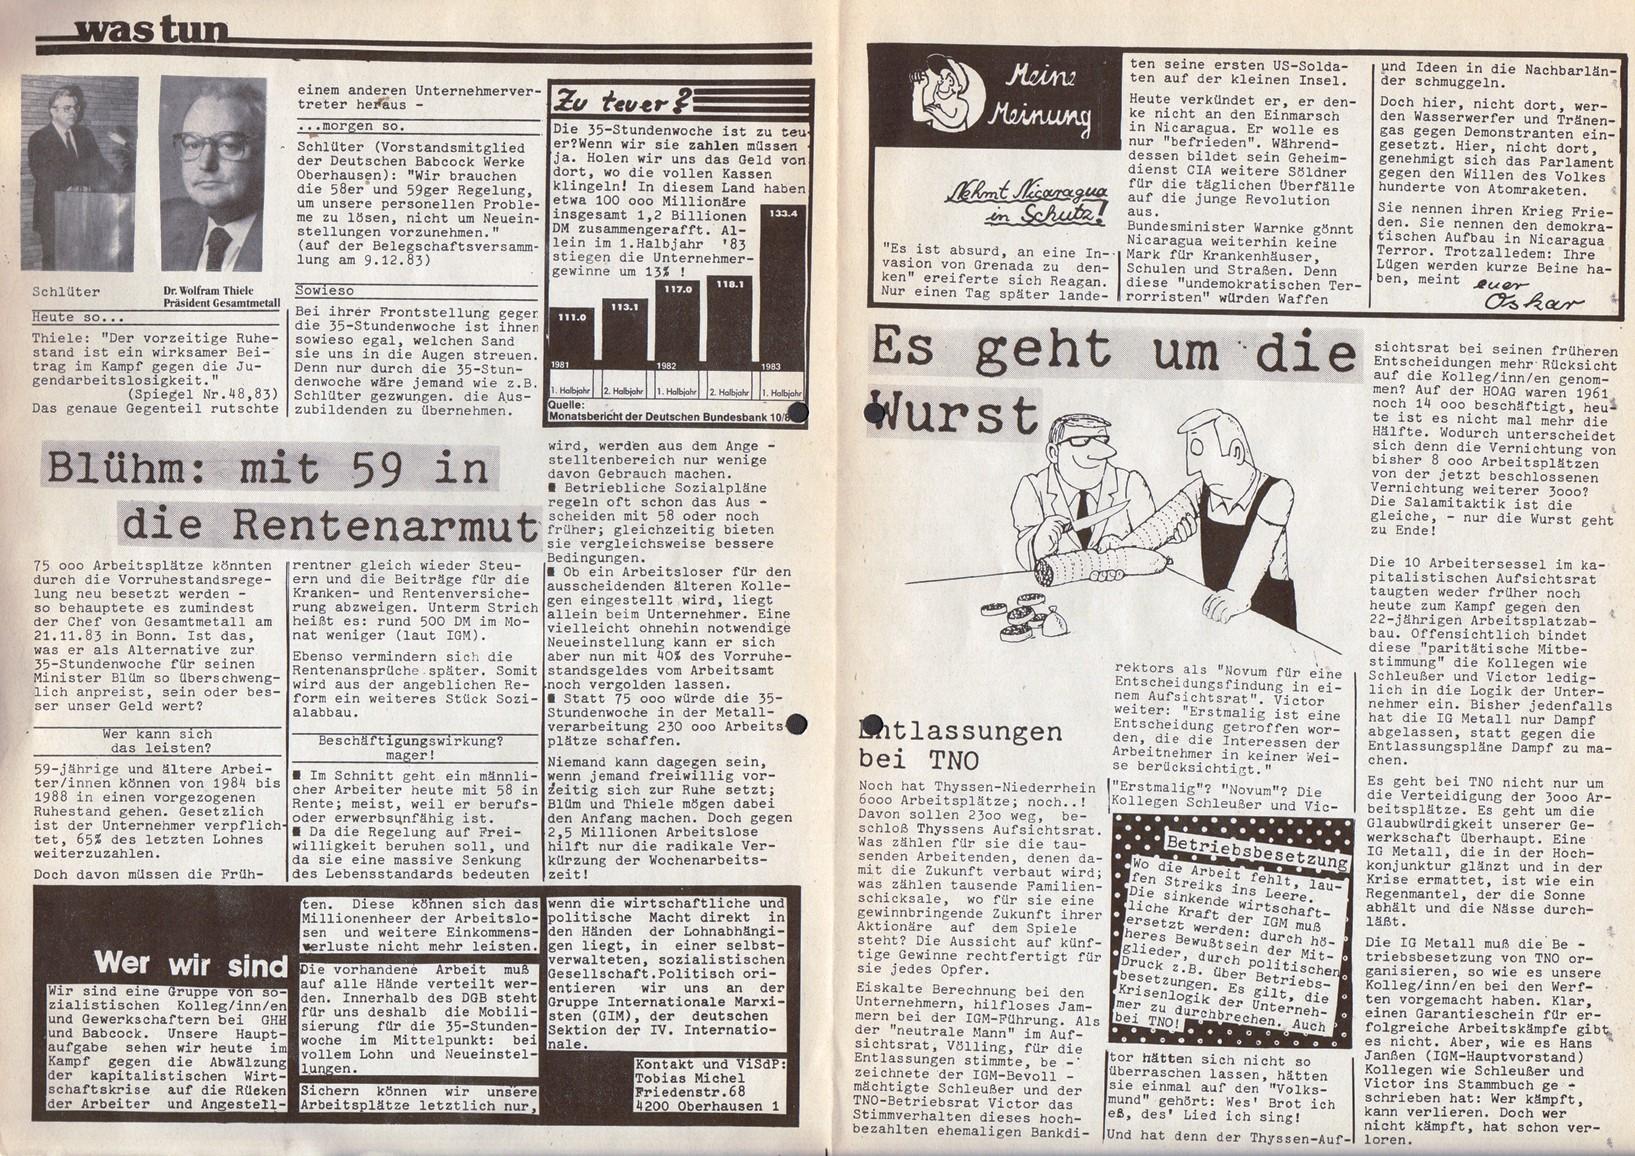 Oberhausen_GIM_Was_tun_bei_Babcock_19831200_02